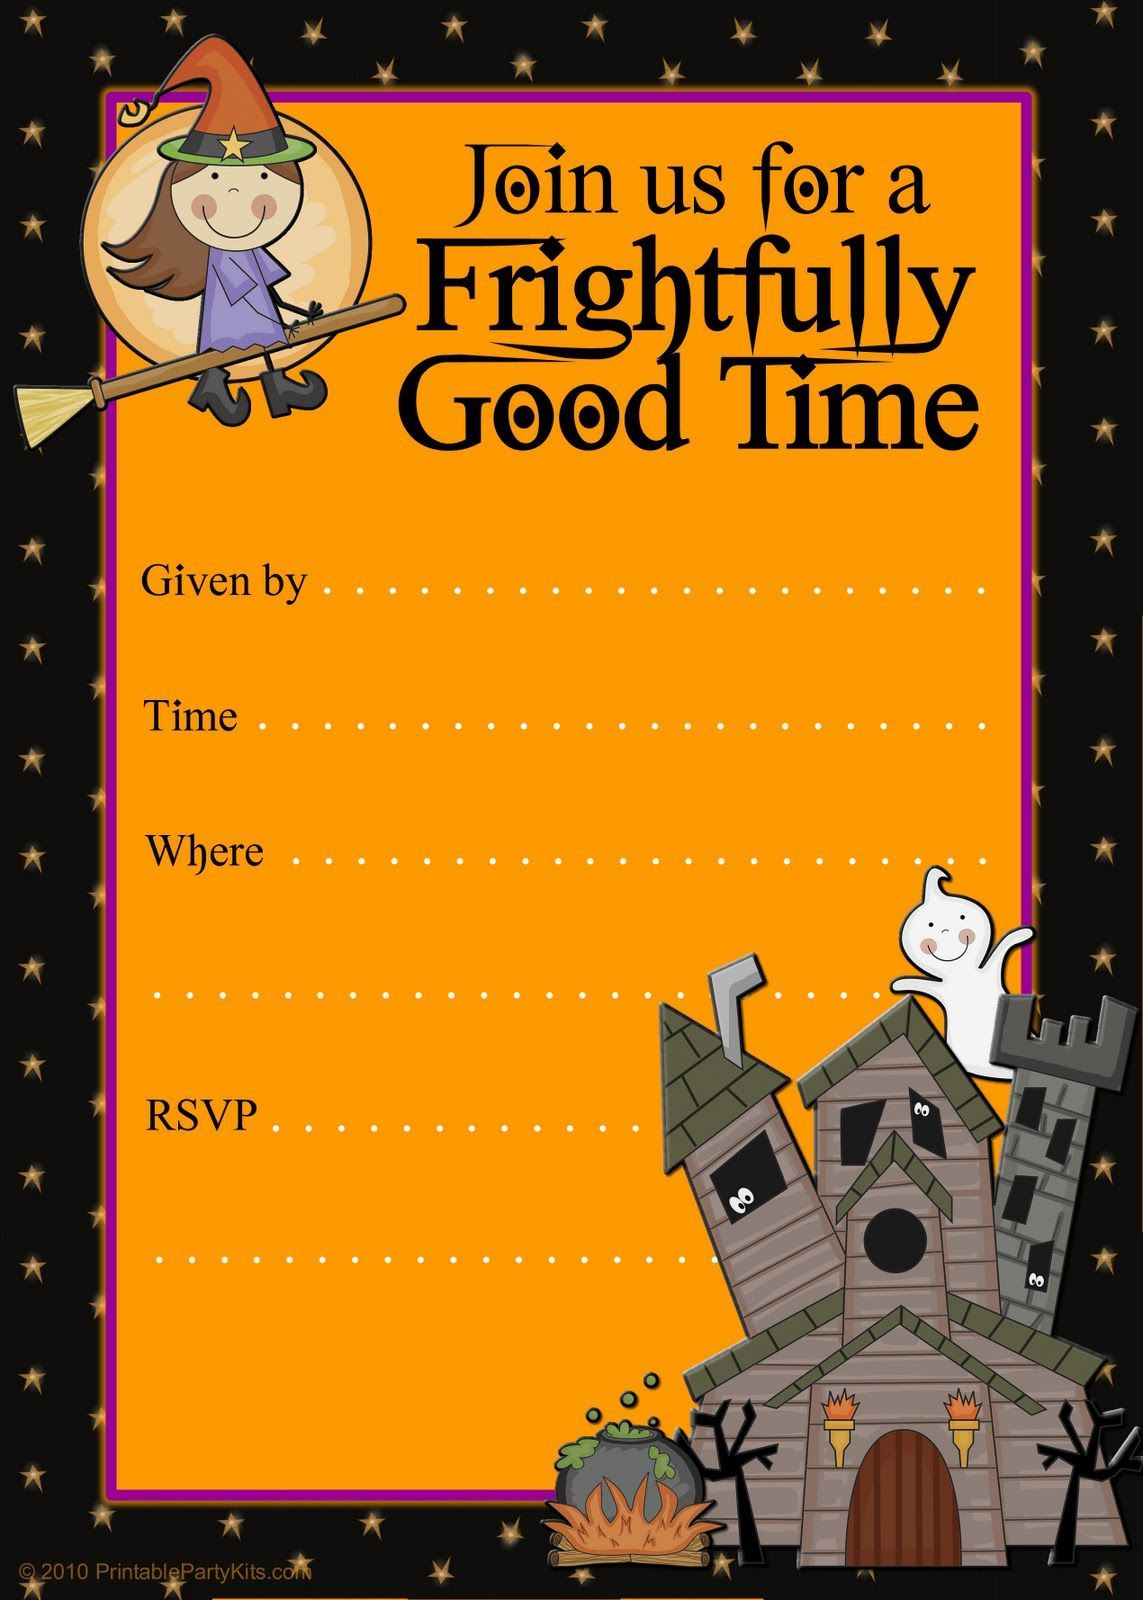 000 Surprising Halloween Party Invite Template Design  Templates - Free Printable Spooky Invitation BirthdayFull